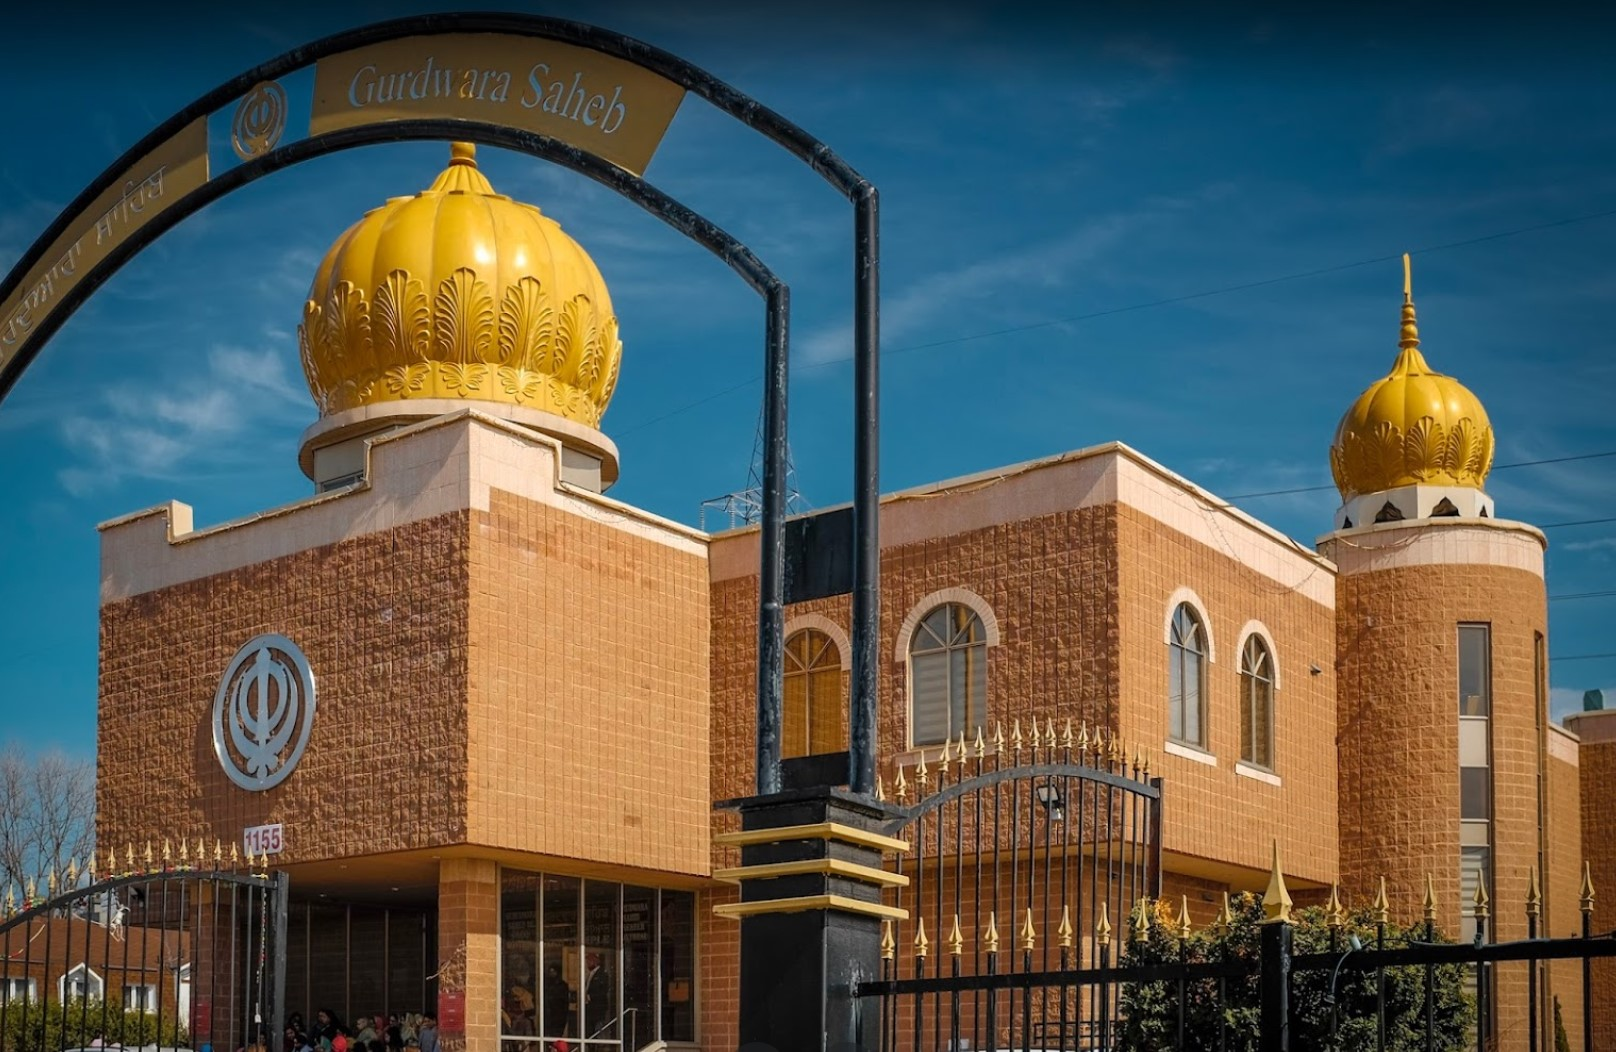 Gurdwara Sahib Greater Montreal